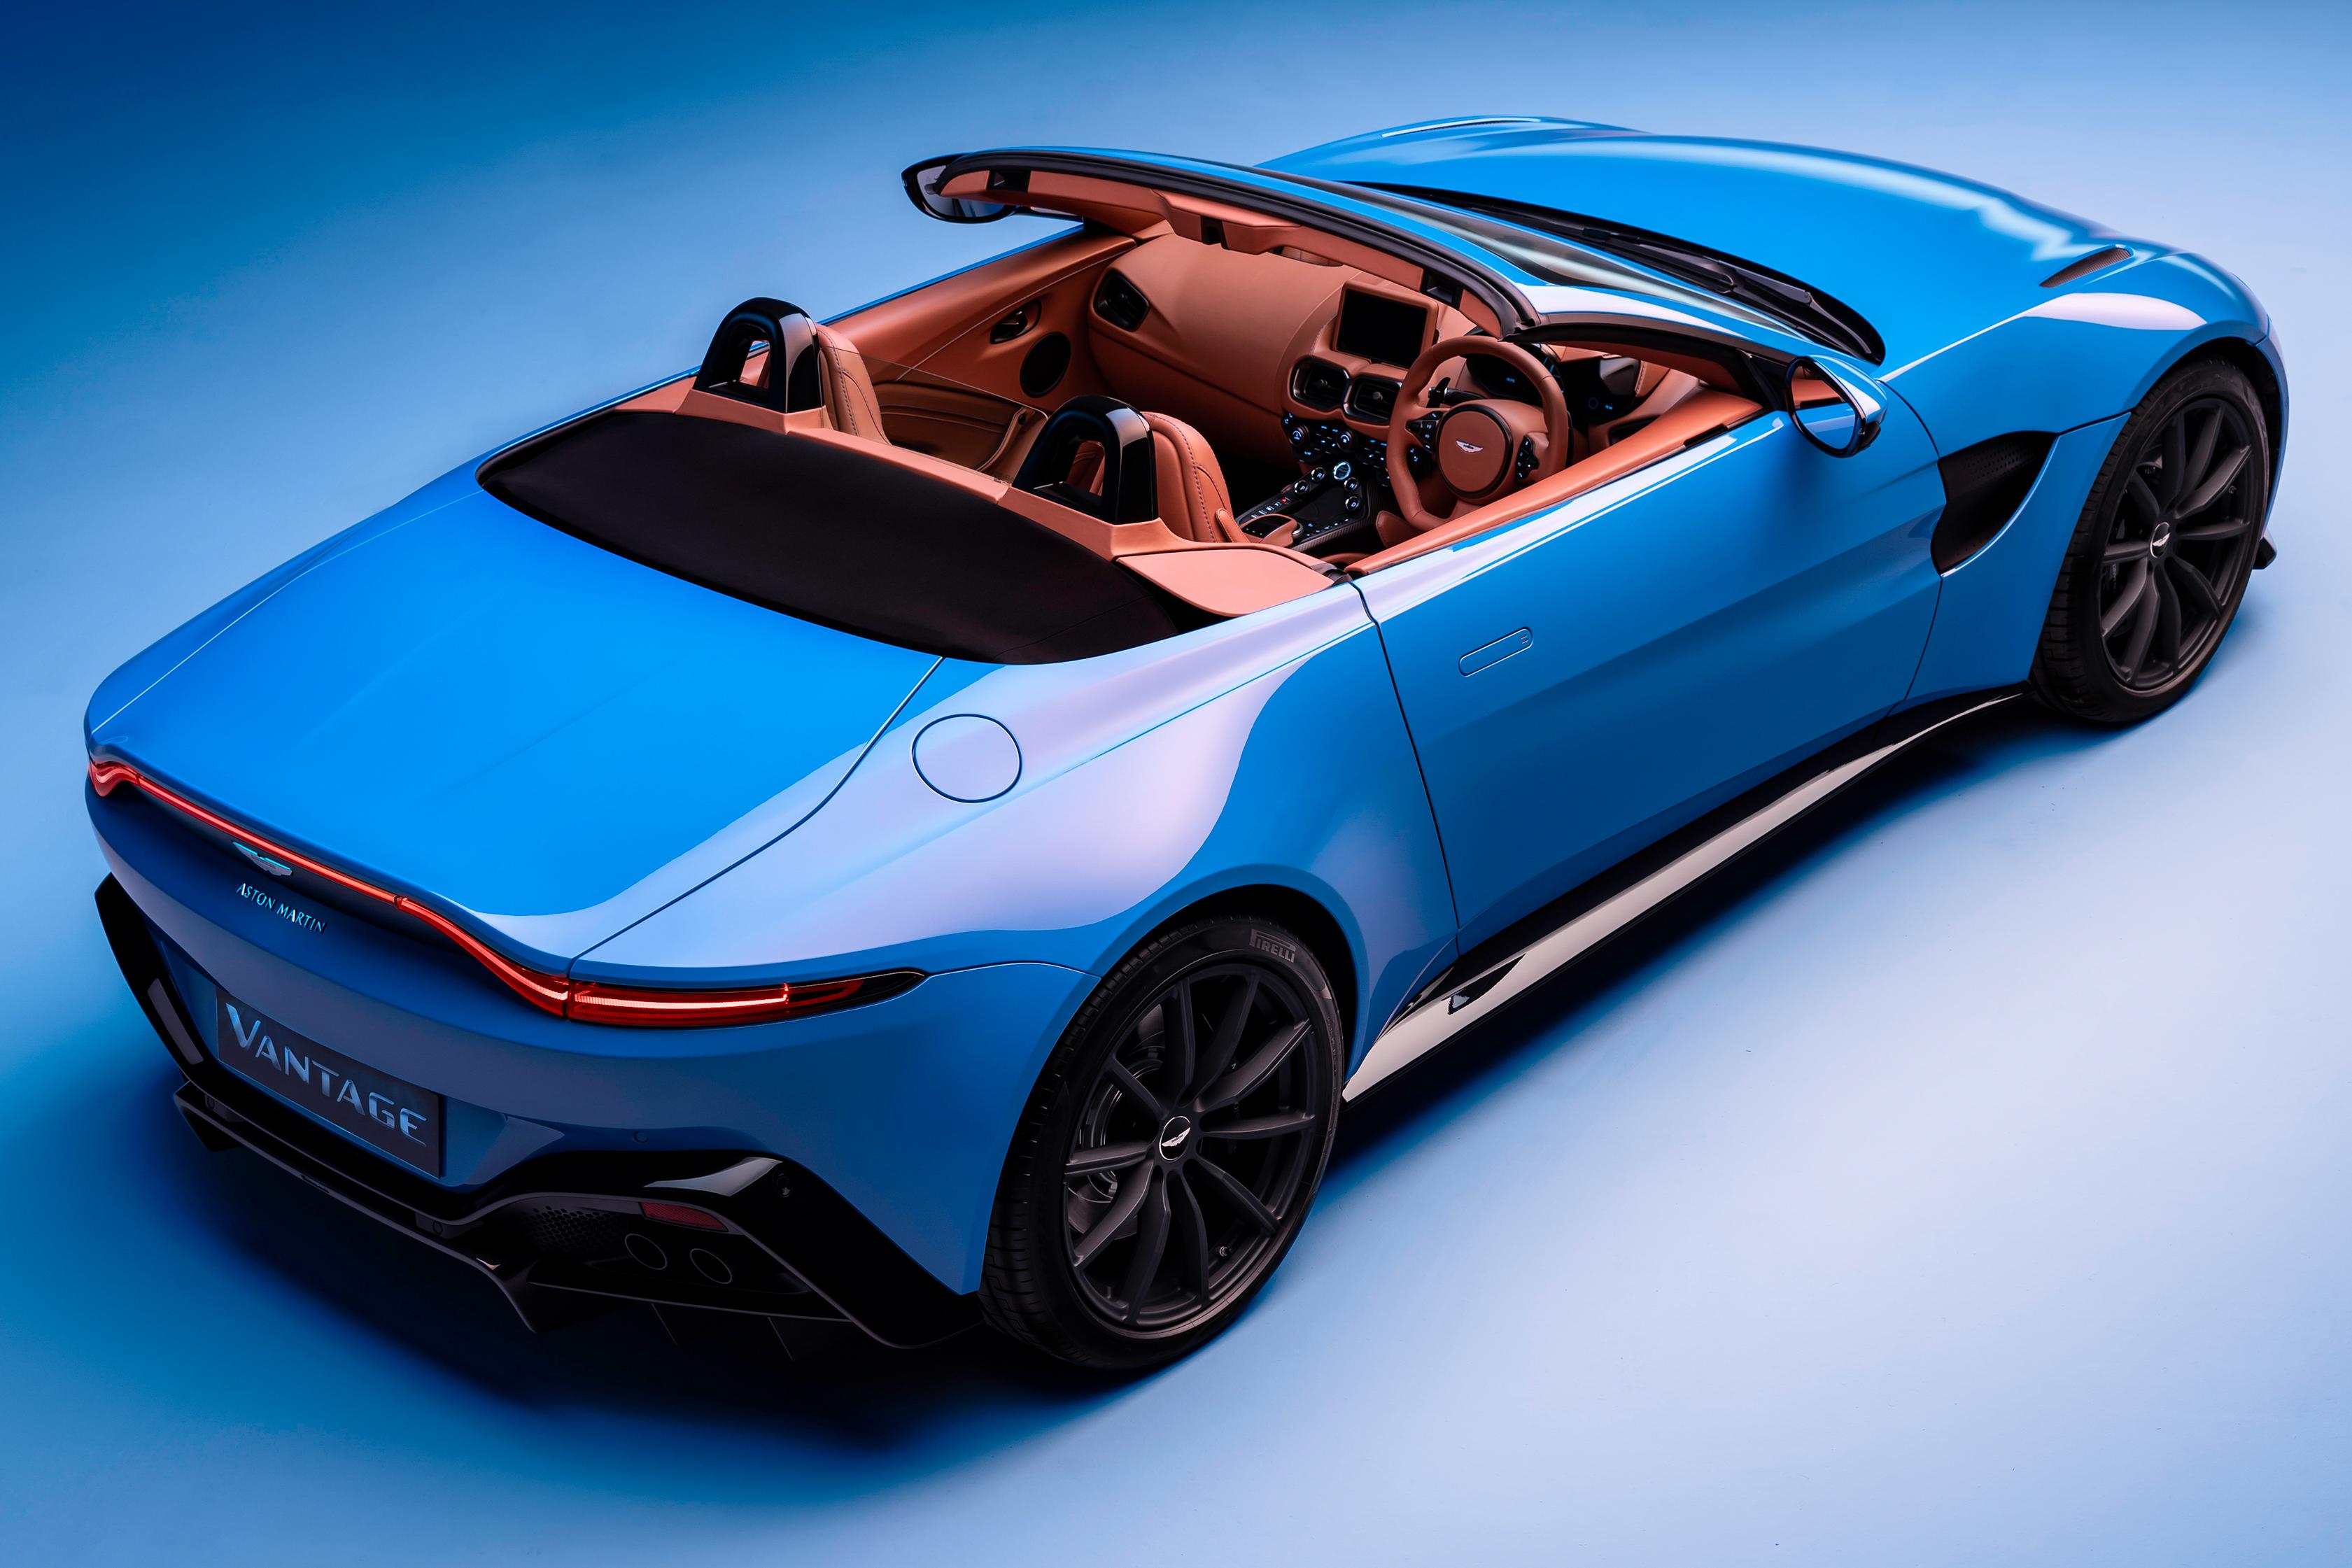 2020-aston-martin-vantage-roadster-7.jpg